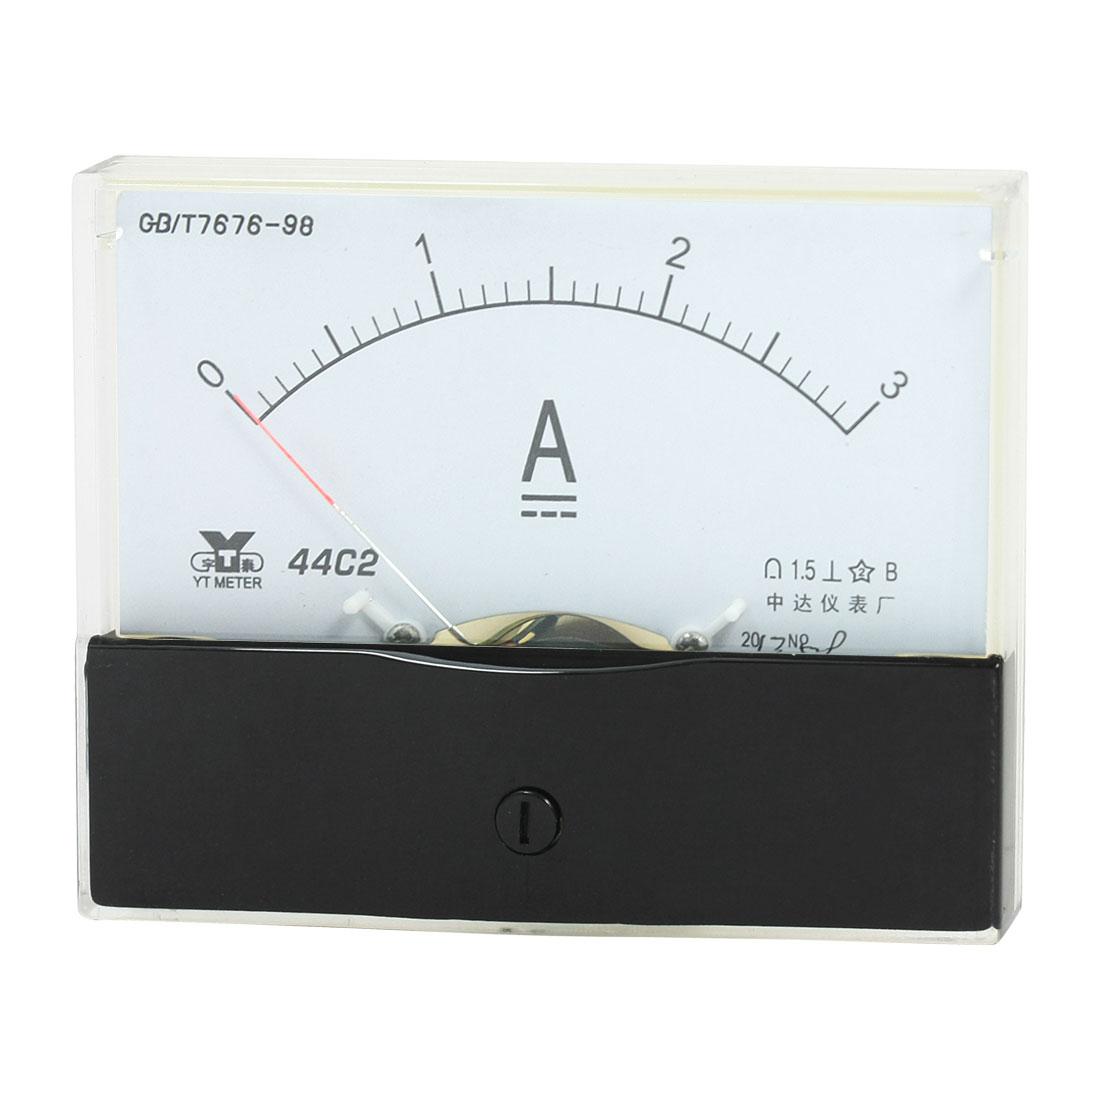 Rectangle Measurement Tool Analog Panel Ammeter Gauge DC 0 - 3A Measuring Range 44C2